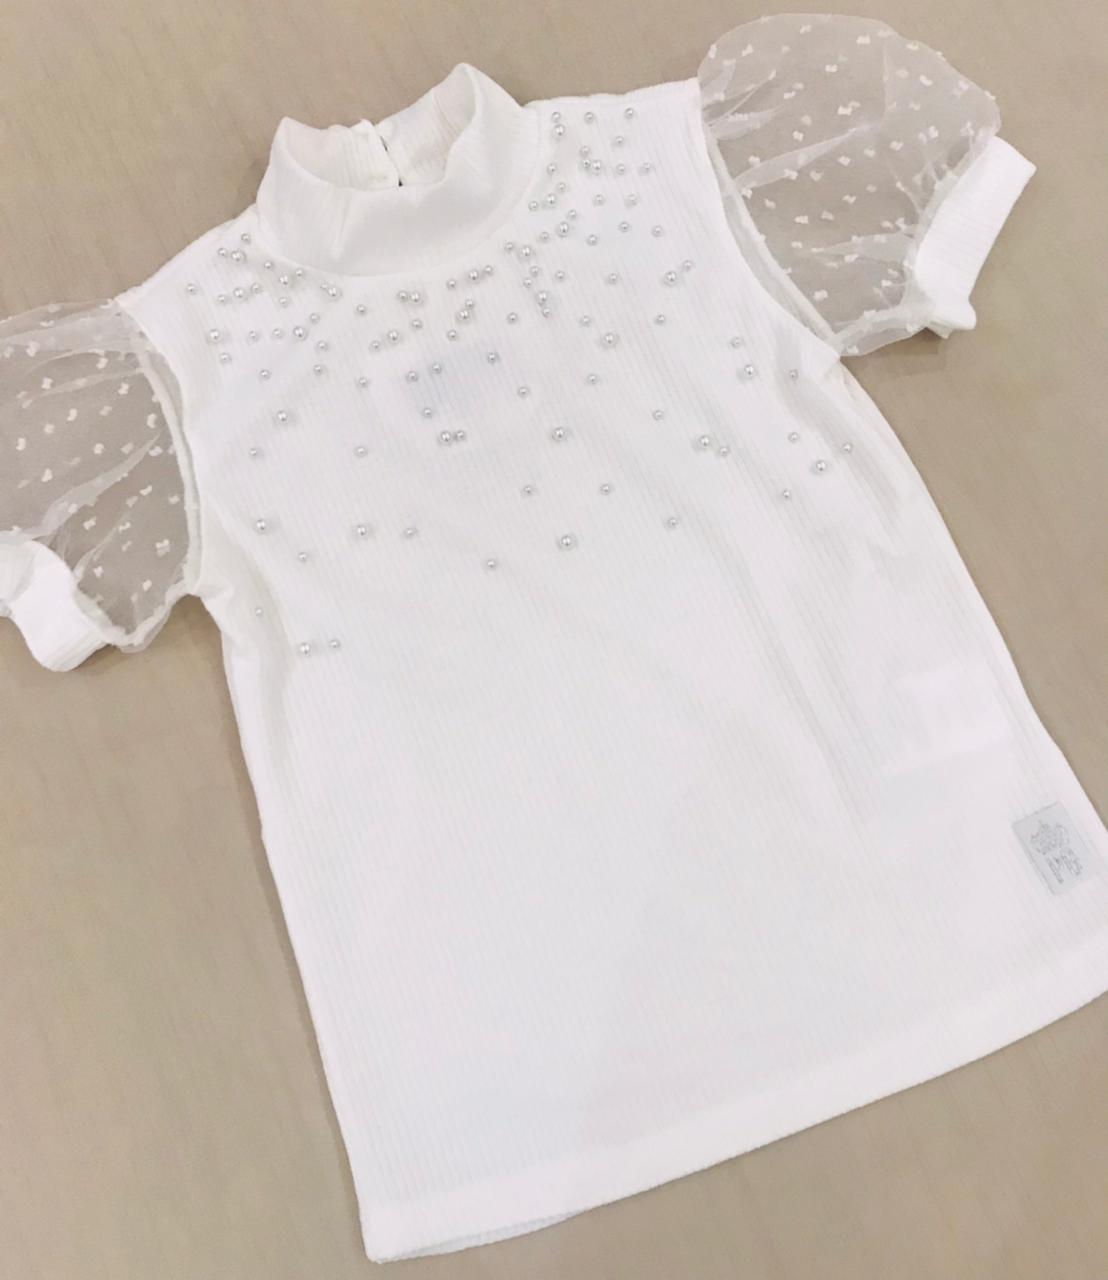 BLUSA INFANTIL PETIT CHERIE - SWEET FLOWER 022